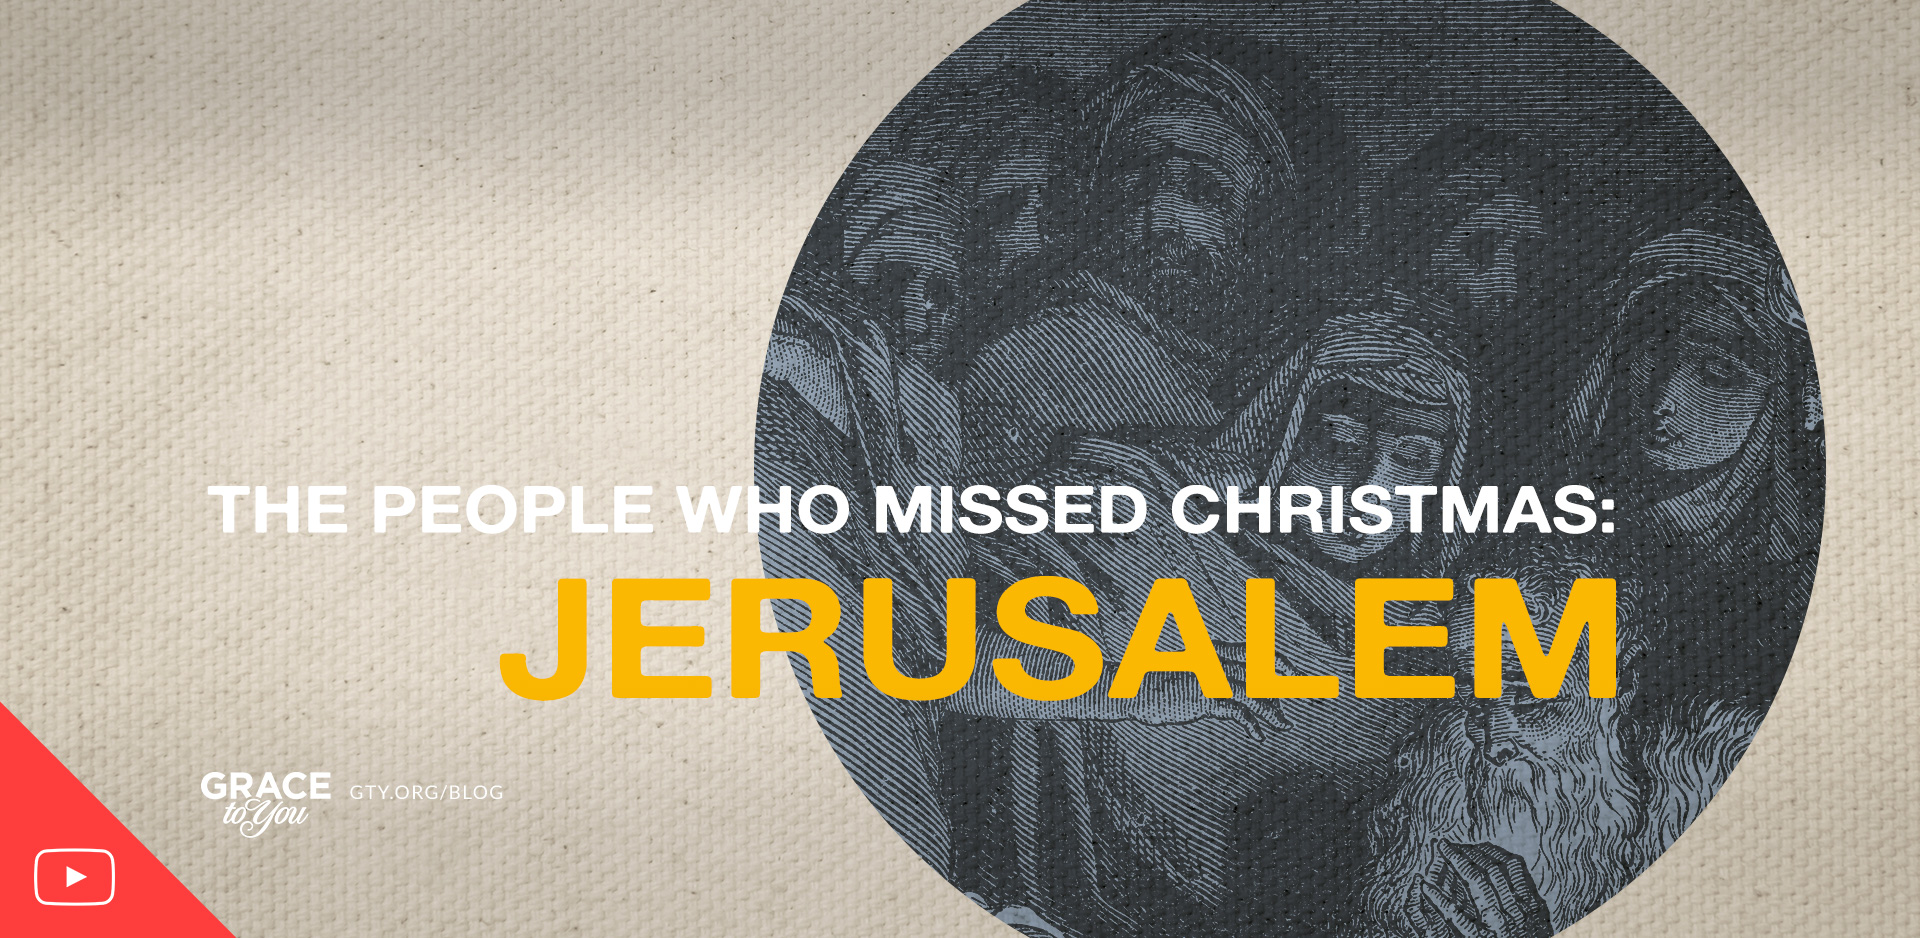 The People Who Missed Christmas: Jerusalem